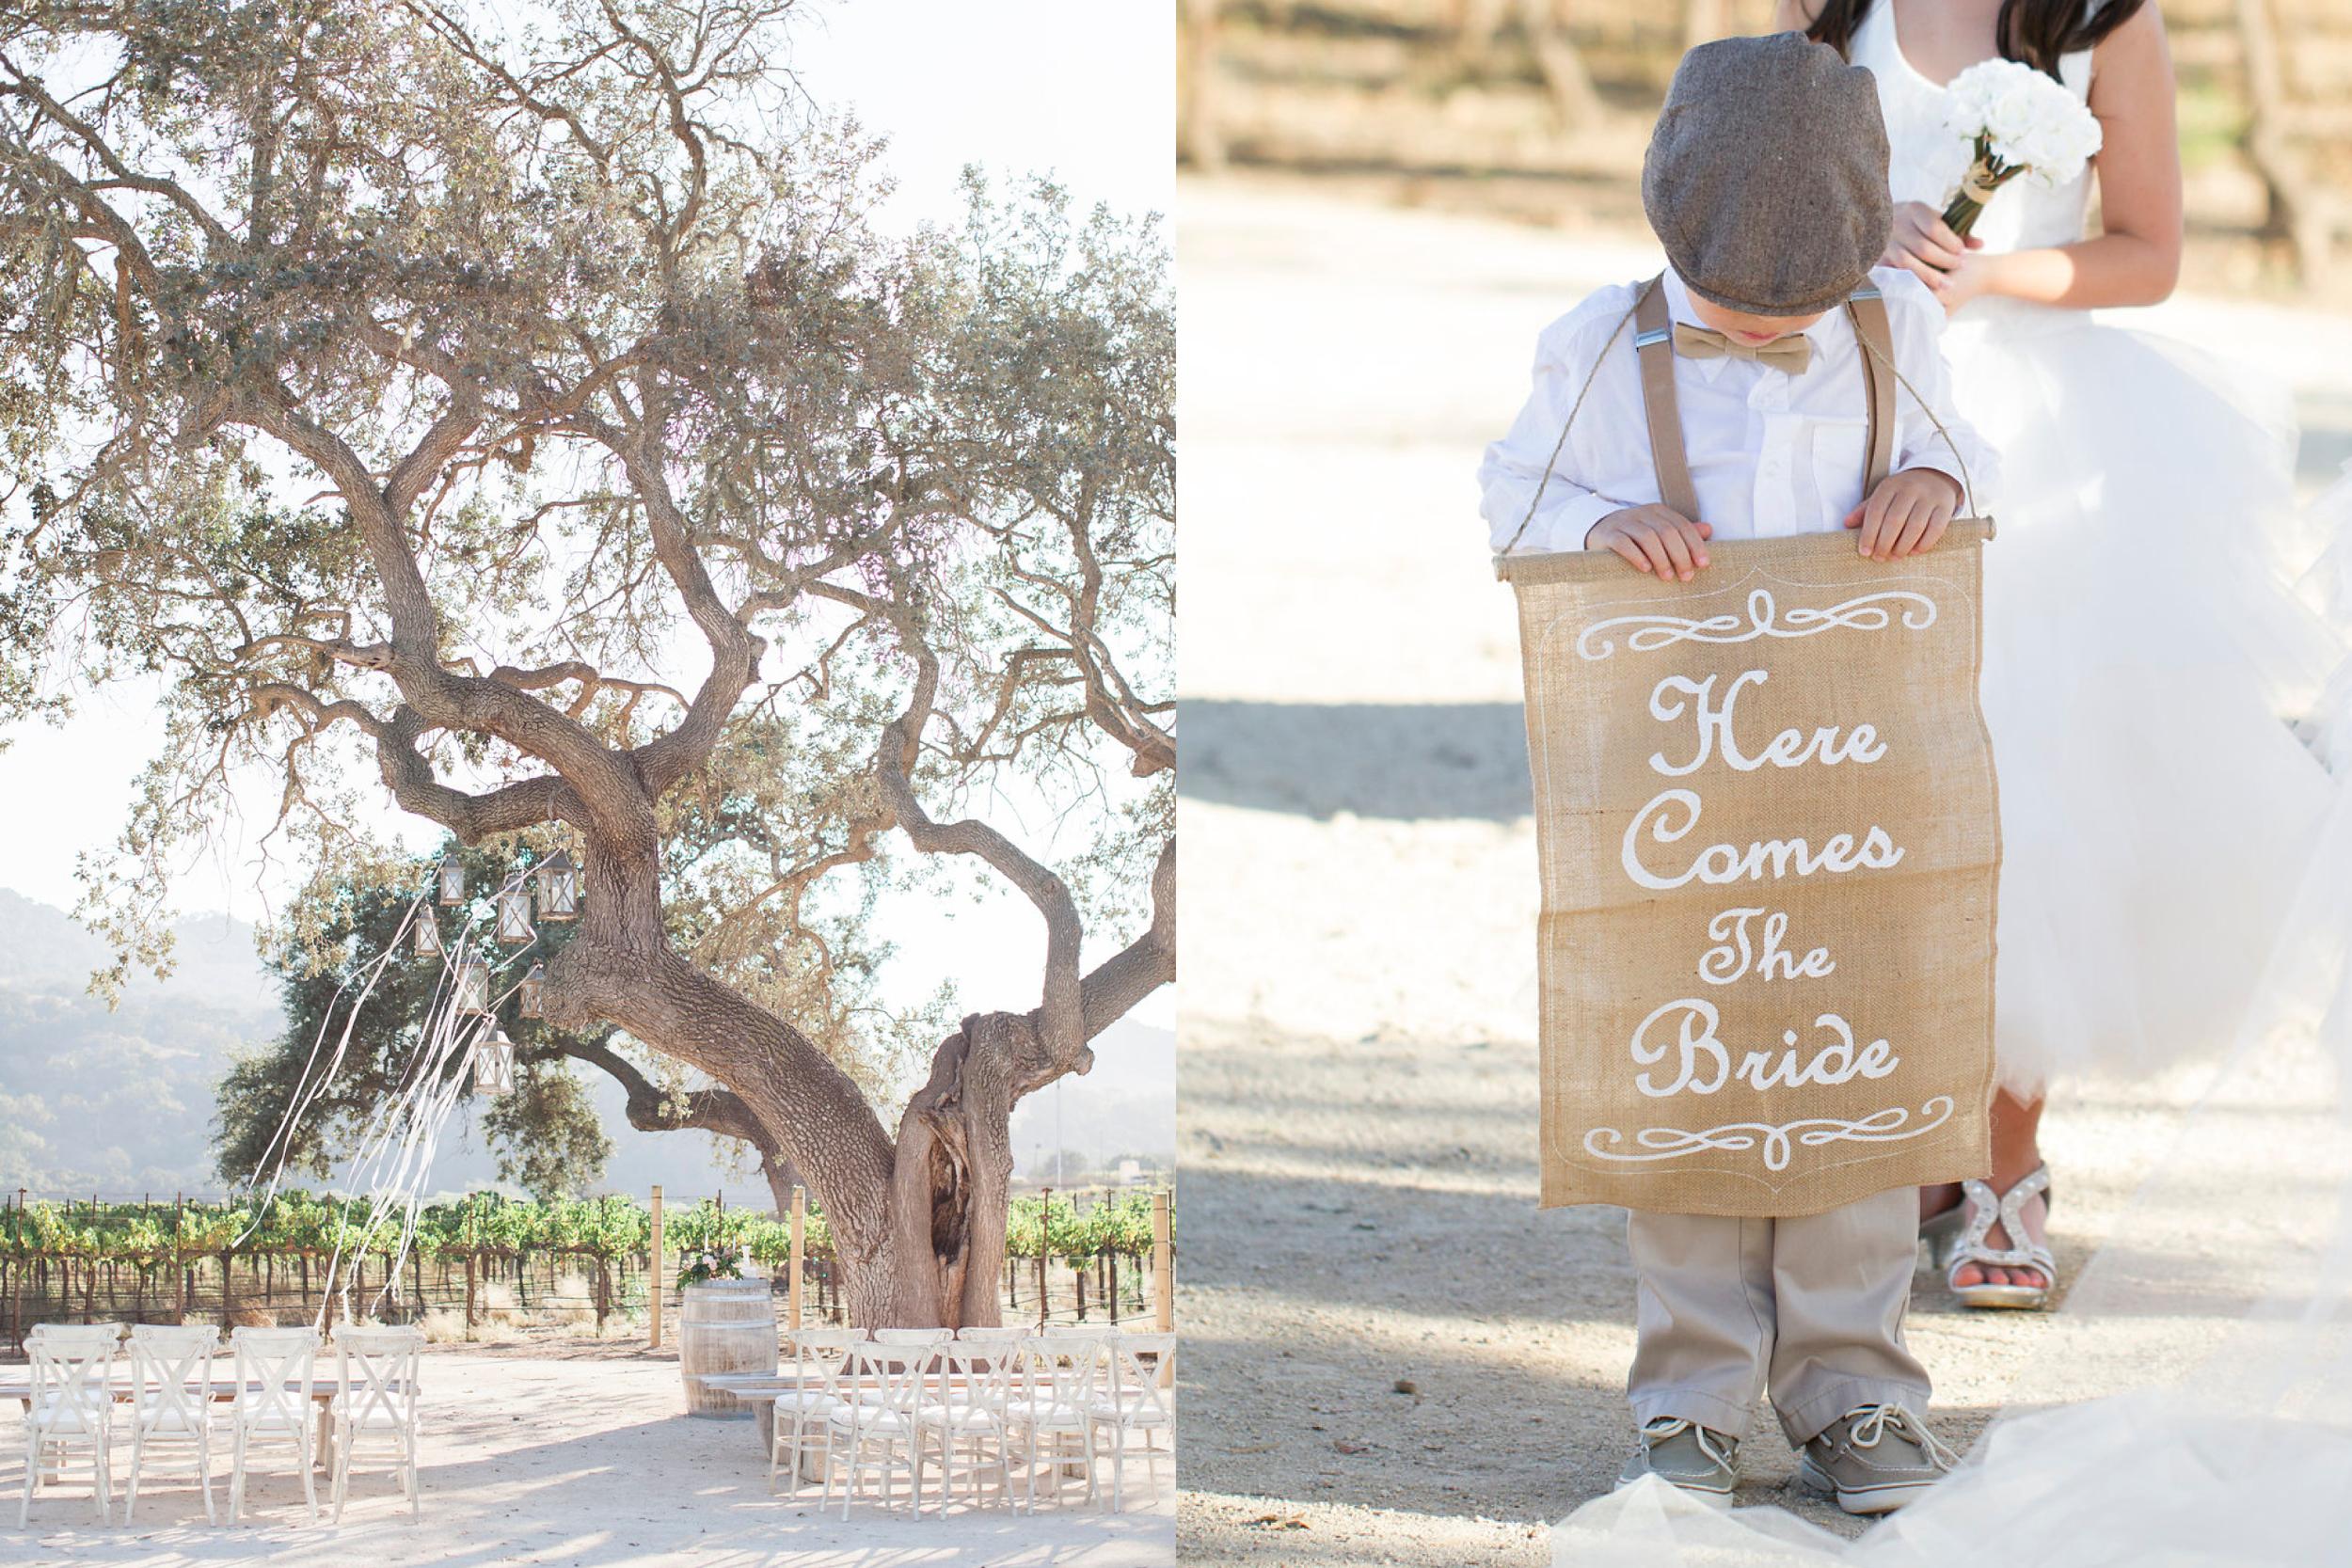 sunstone-villa-wedding-elopement-winery-courtyard-rustic-vineyard-alegria-by-design-tuscany-garland-peonies-oaktree (15).jpg